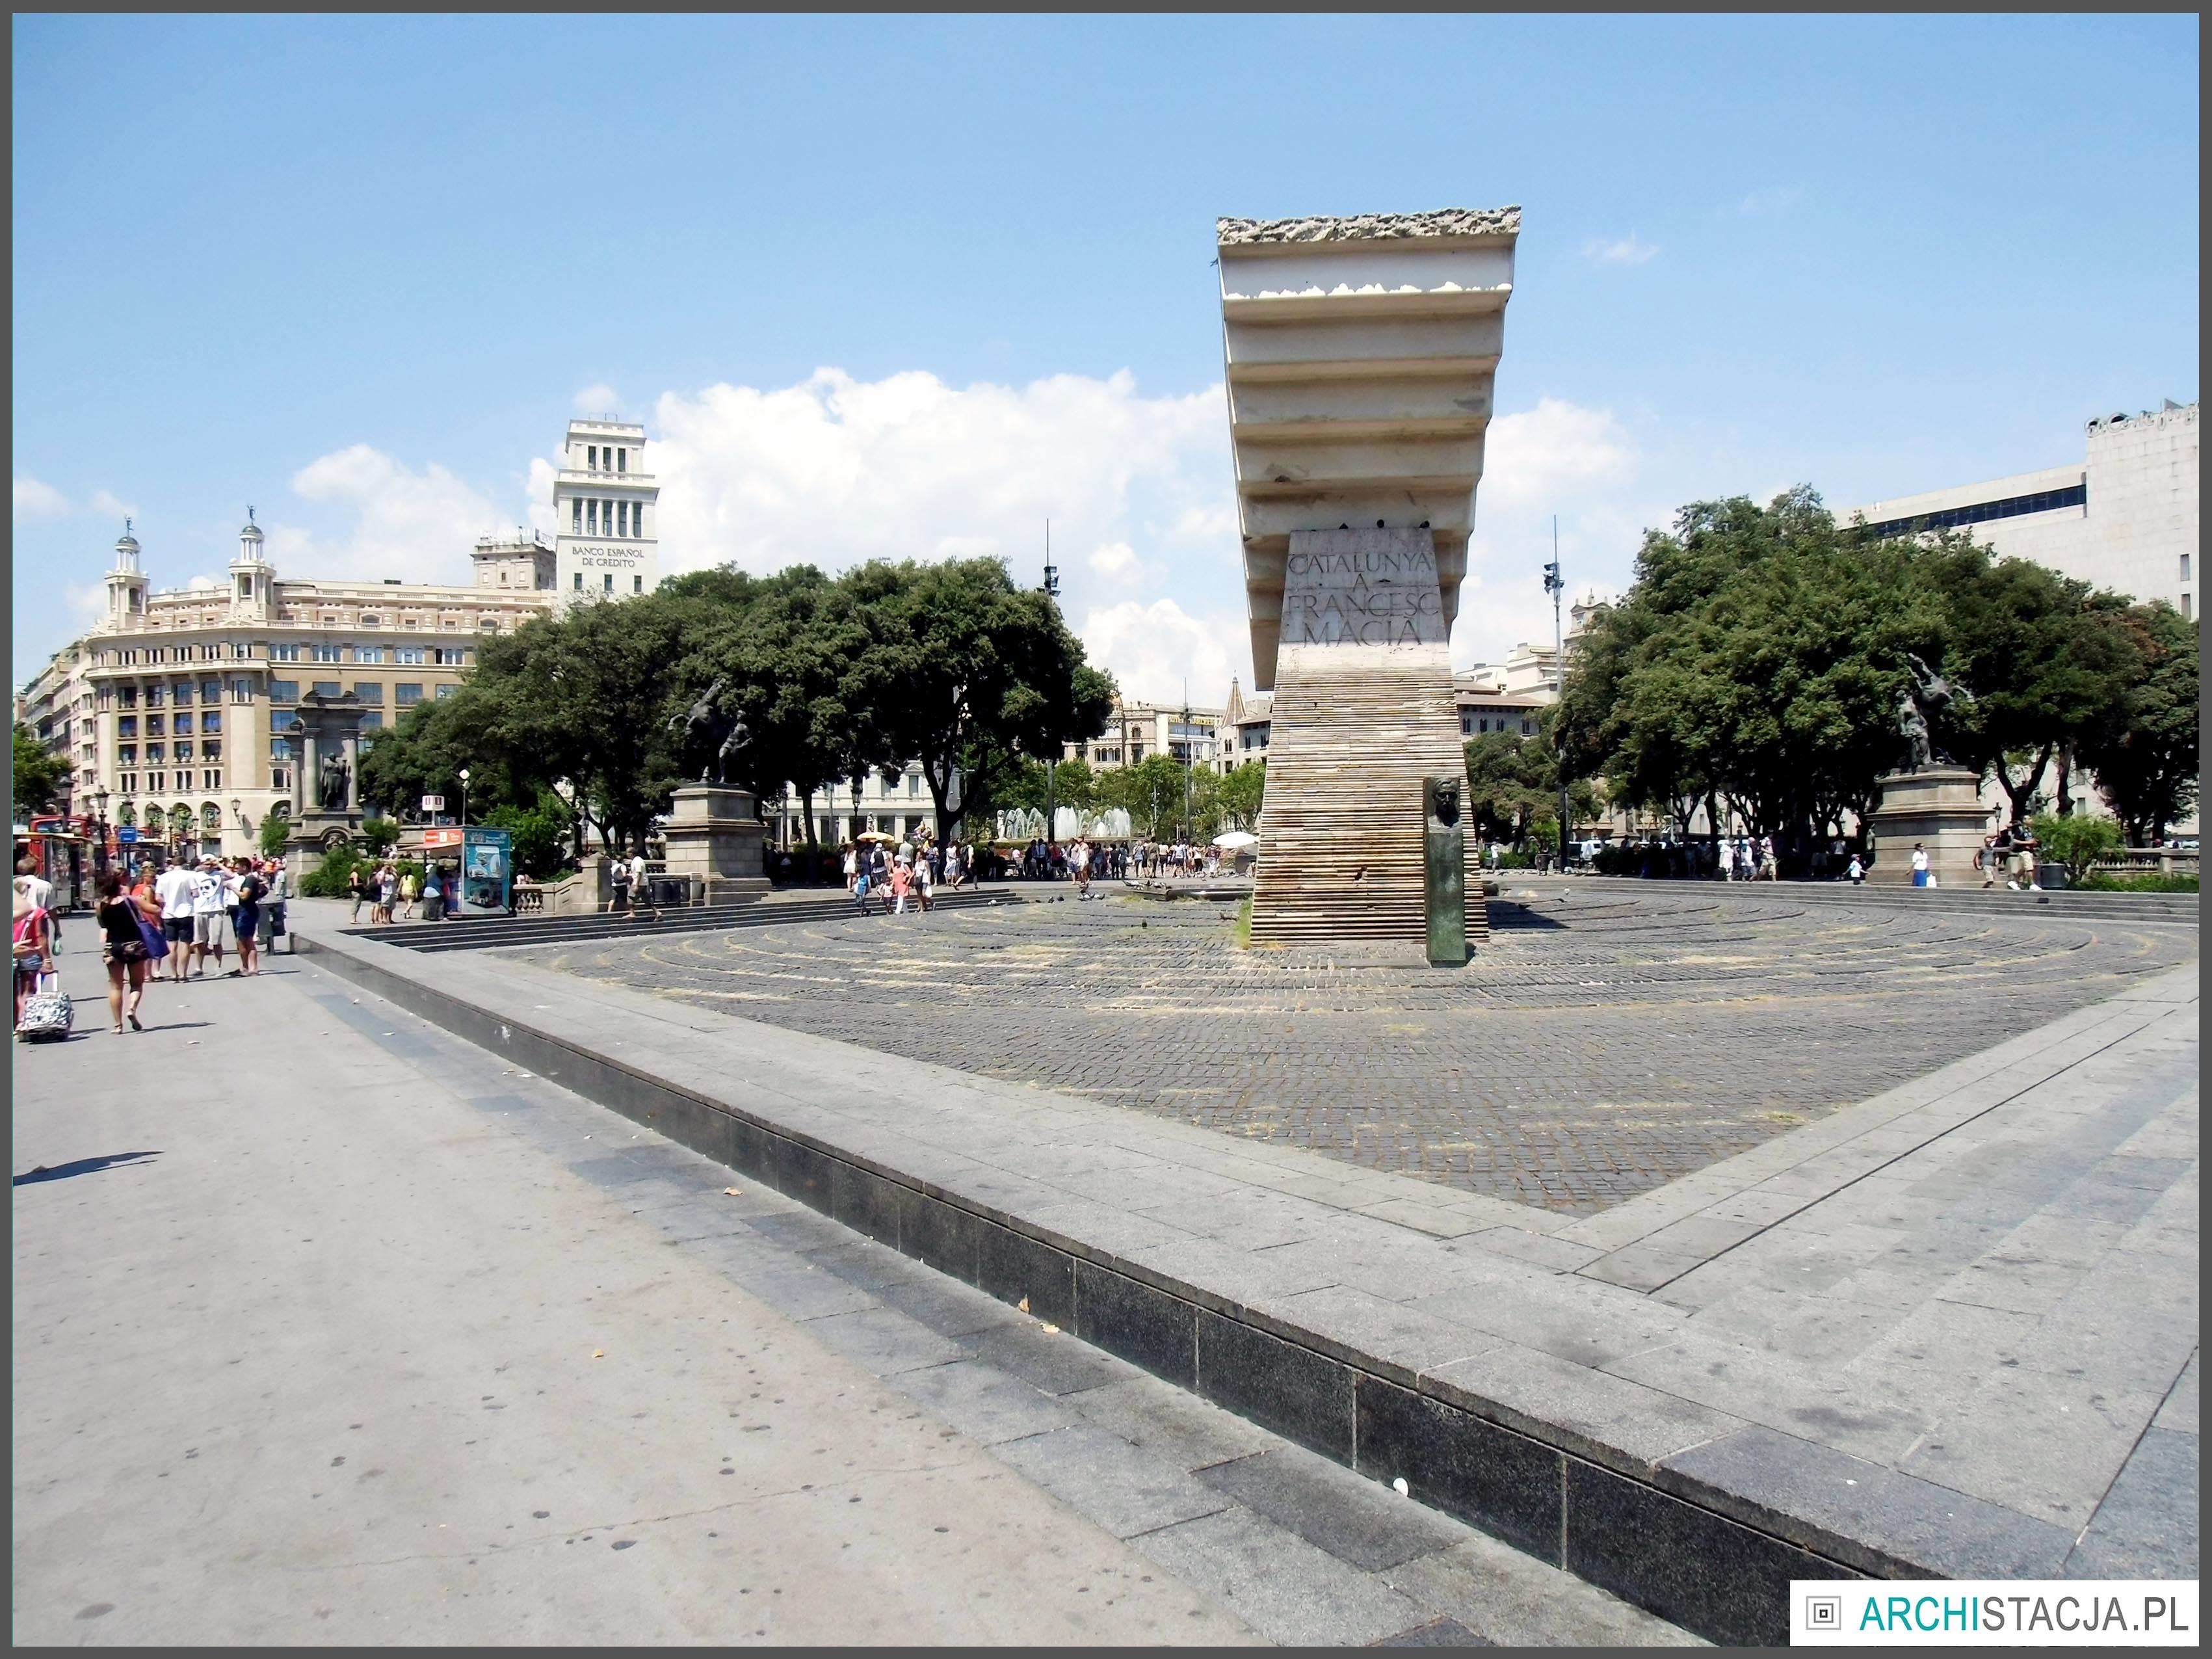 plac kataloński